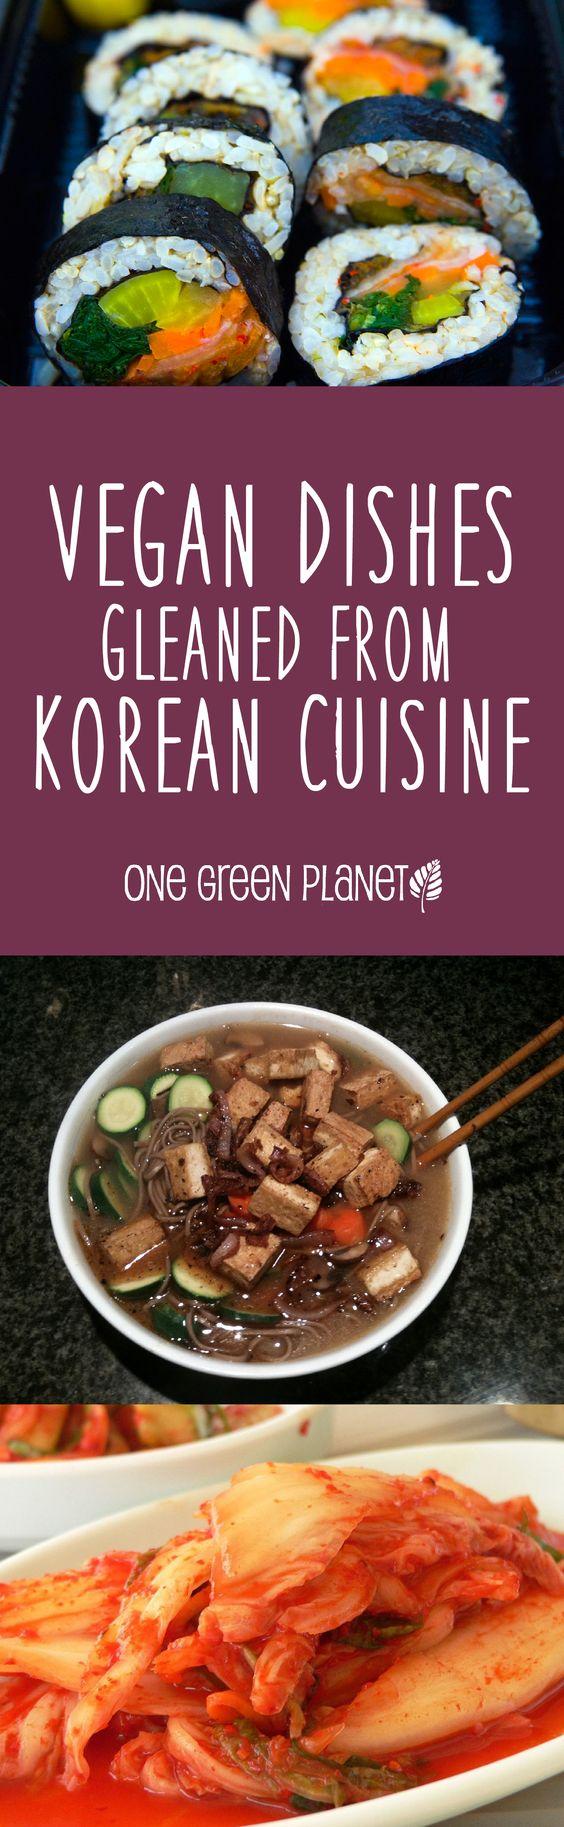 http://onegr.pl/1yrx0C7 #vegan #vegetarian #korean #recipes